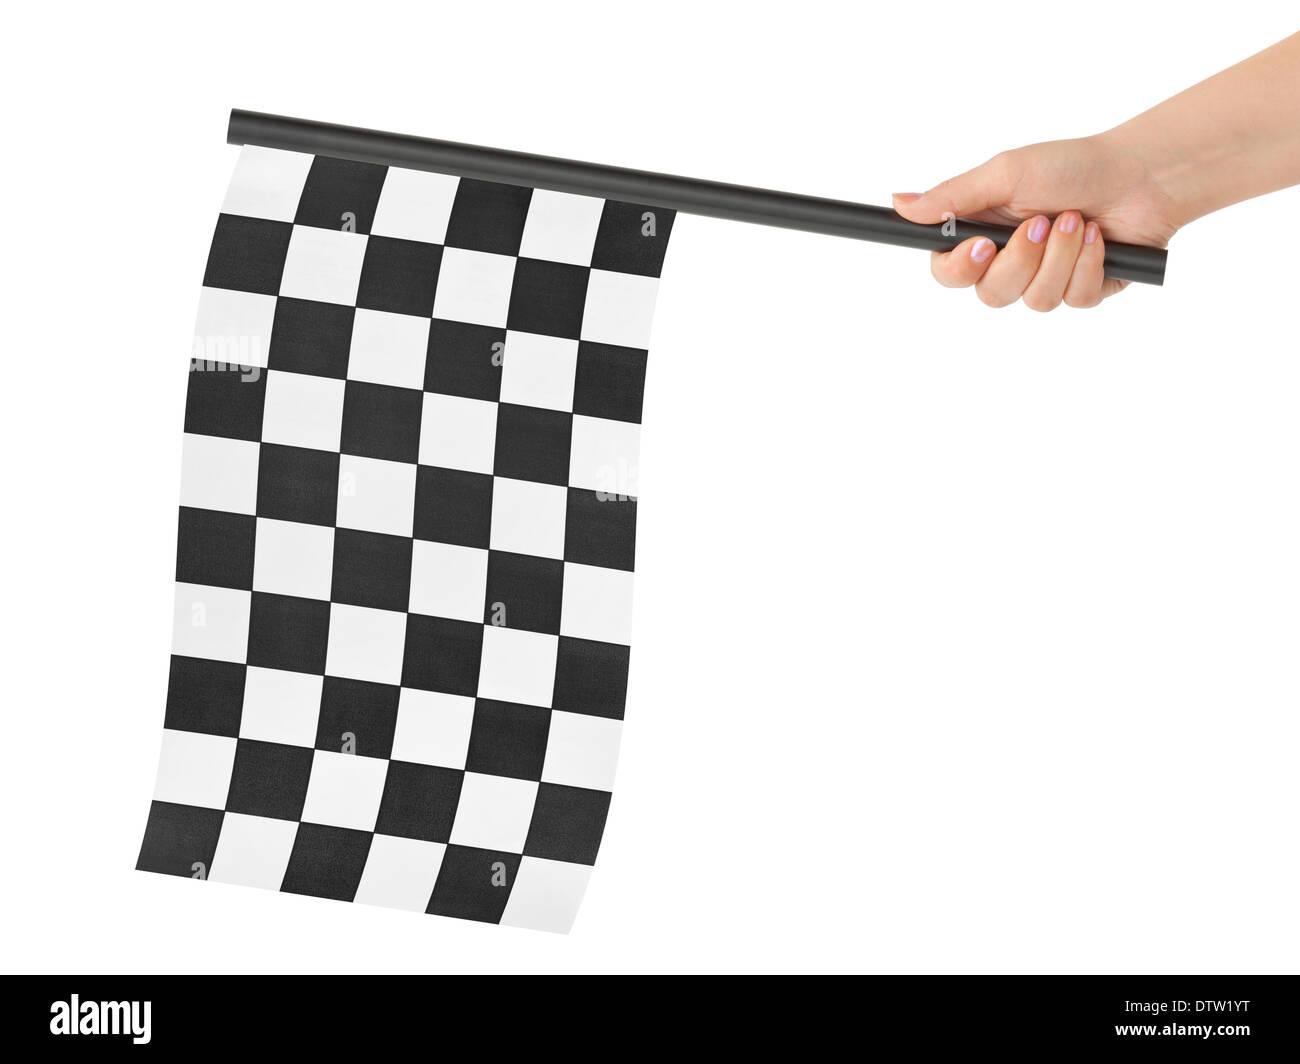 Checkered final flag - Stock Image